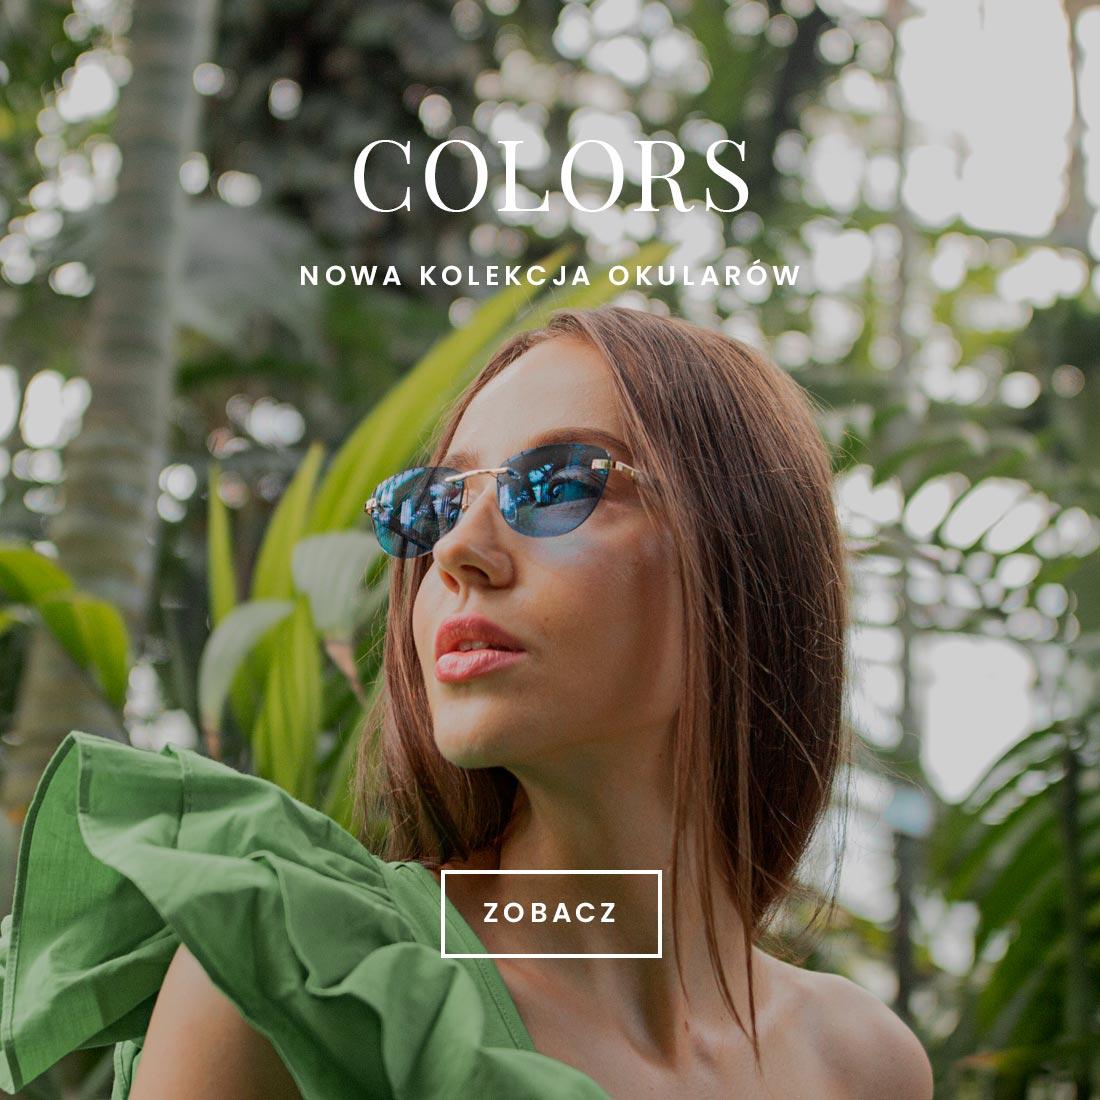 SG_okulary_colors_1100x1100